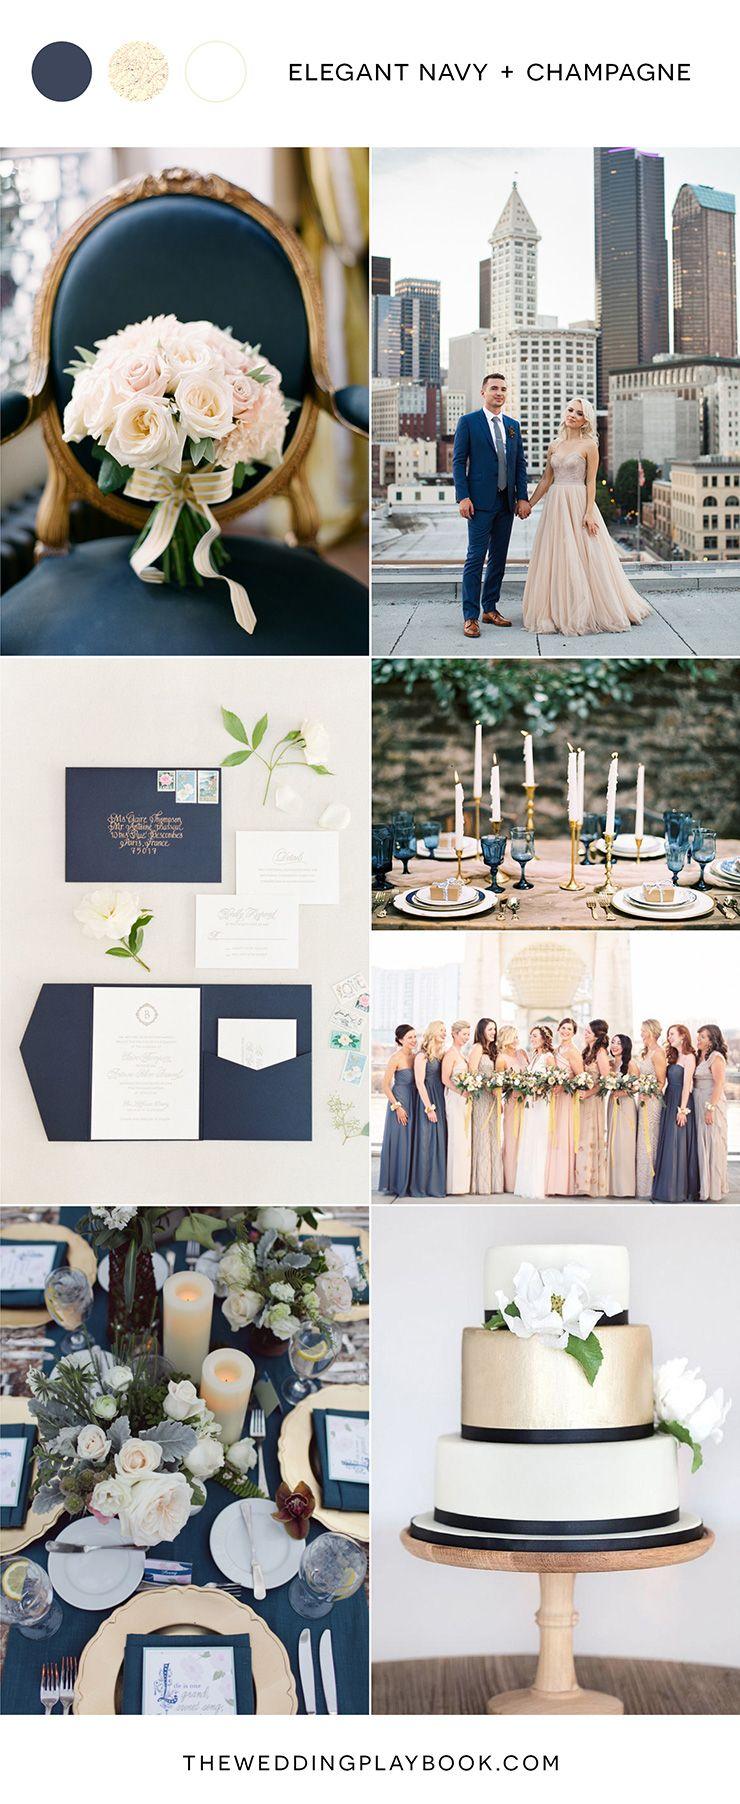 Elegant navy, cream and champagne wedding inspiration